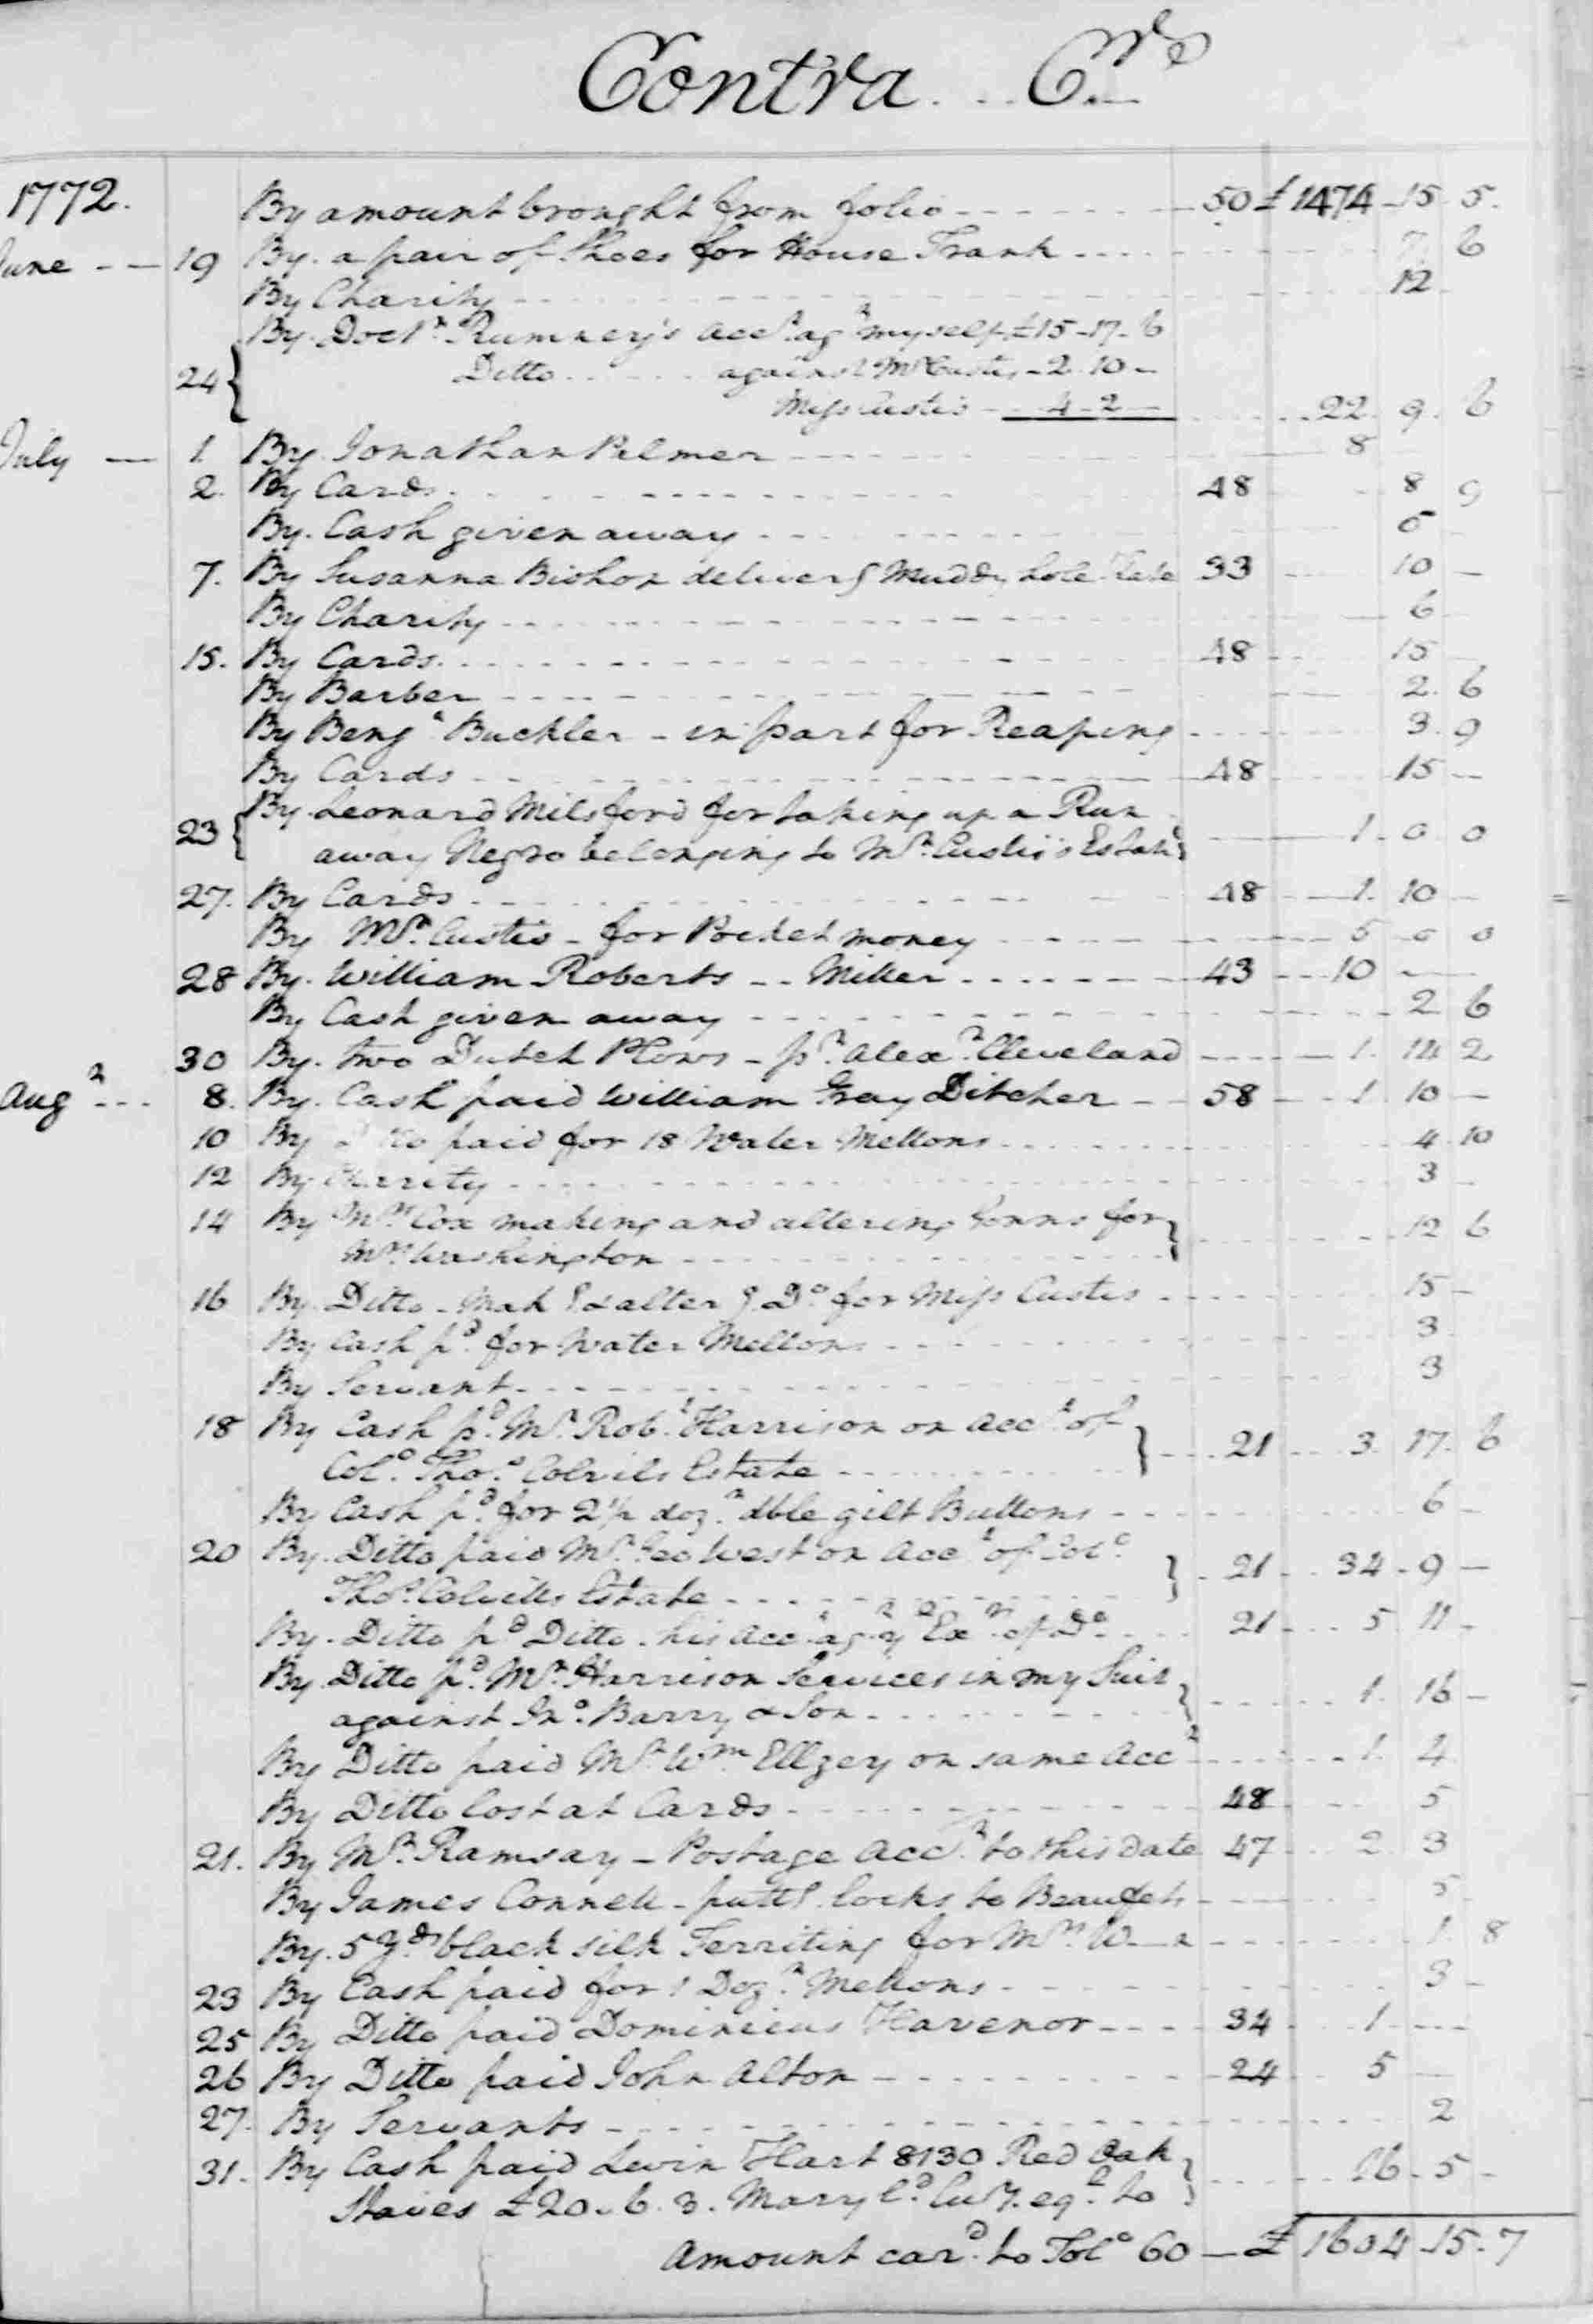 Ledger B, folio 55, right side